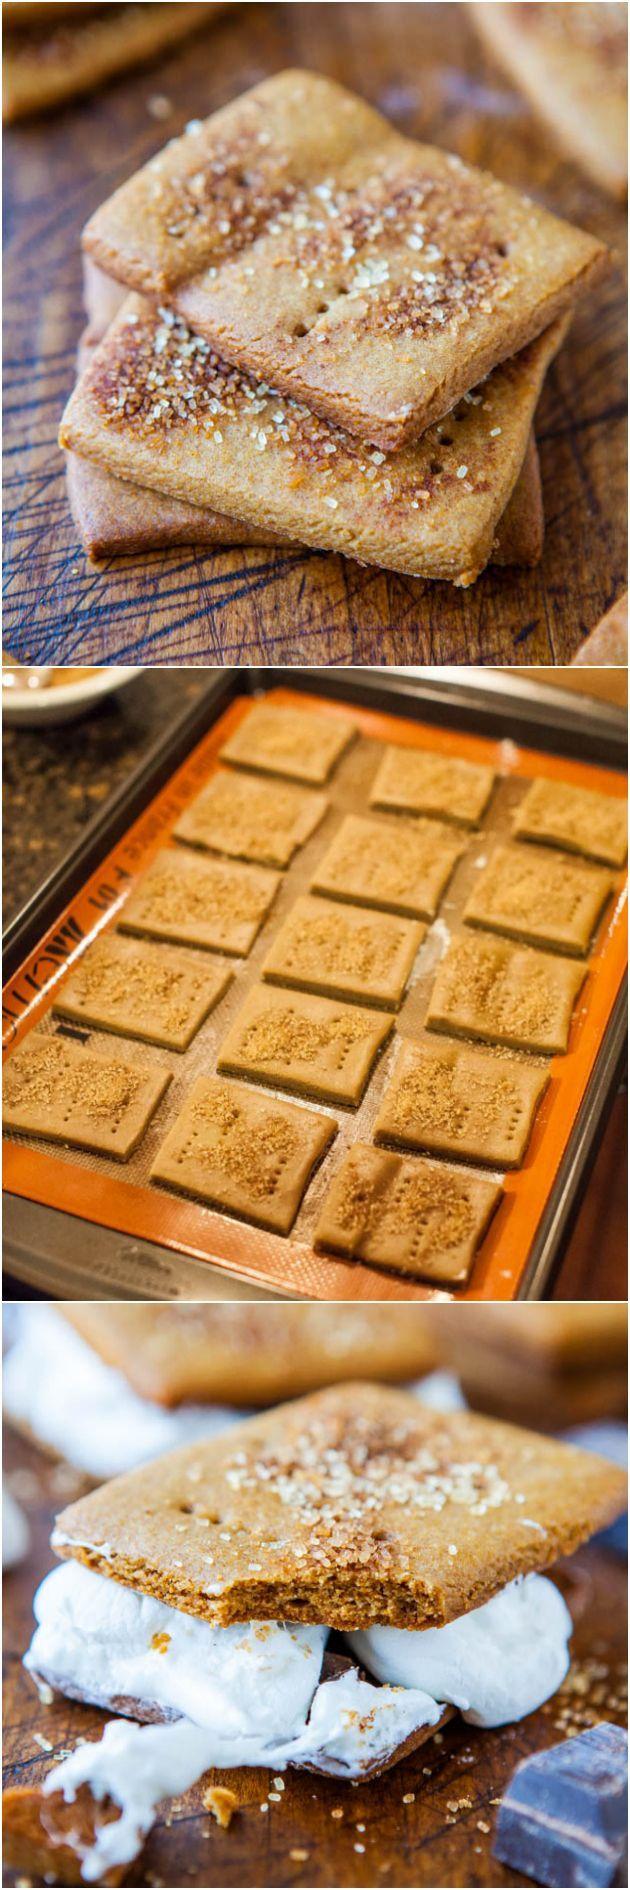 Homemade Cinnamon Sugar Graham Crackers and Smores ...